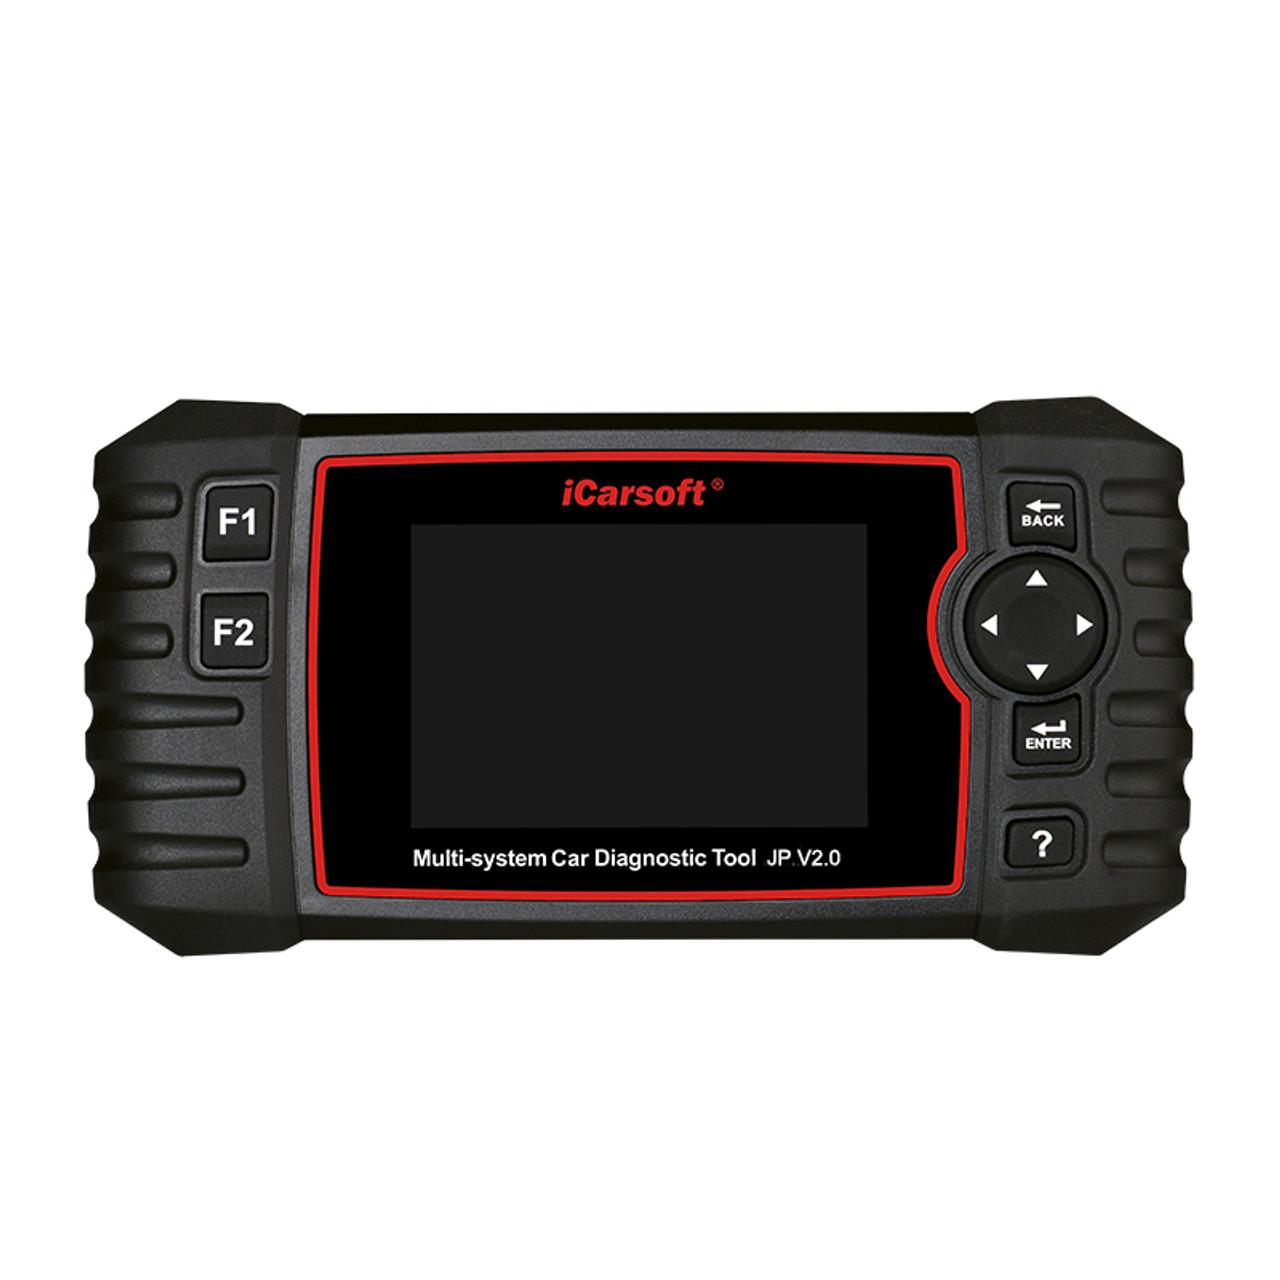 iCarsoft JP V2.0 for Toyota/Lexus/Scion/Isuzu/Nissan/Infiniti/Mitsubishi/Honda(ACURA)/MAZDA/SUBARU/Suzuki